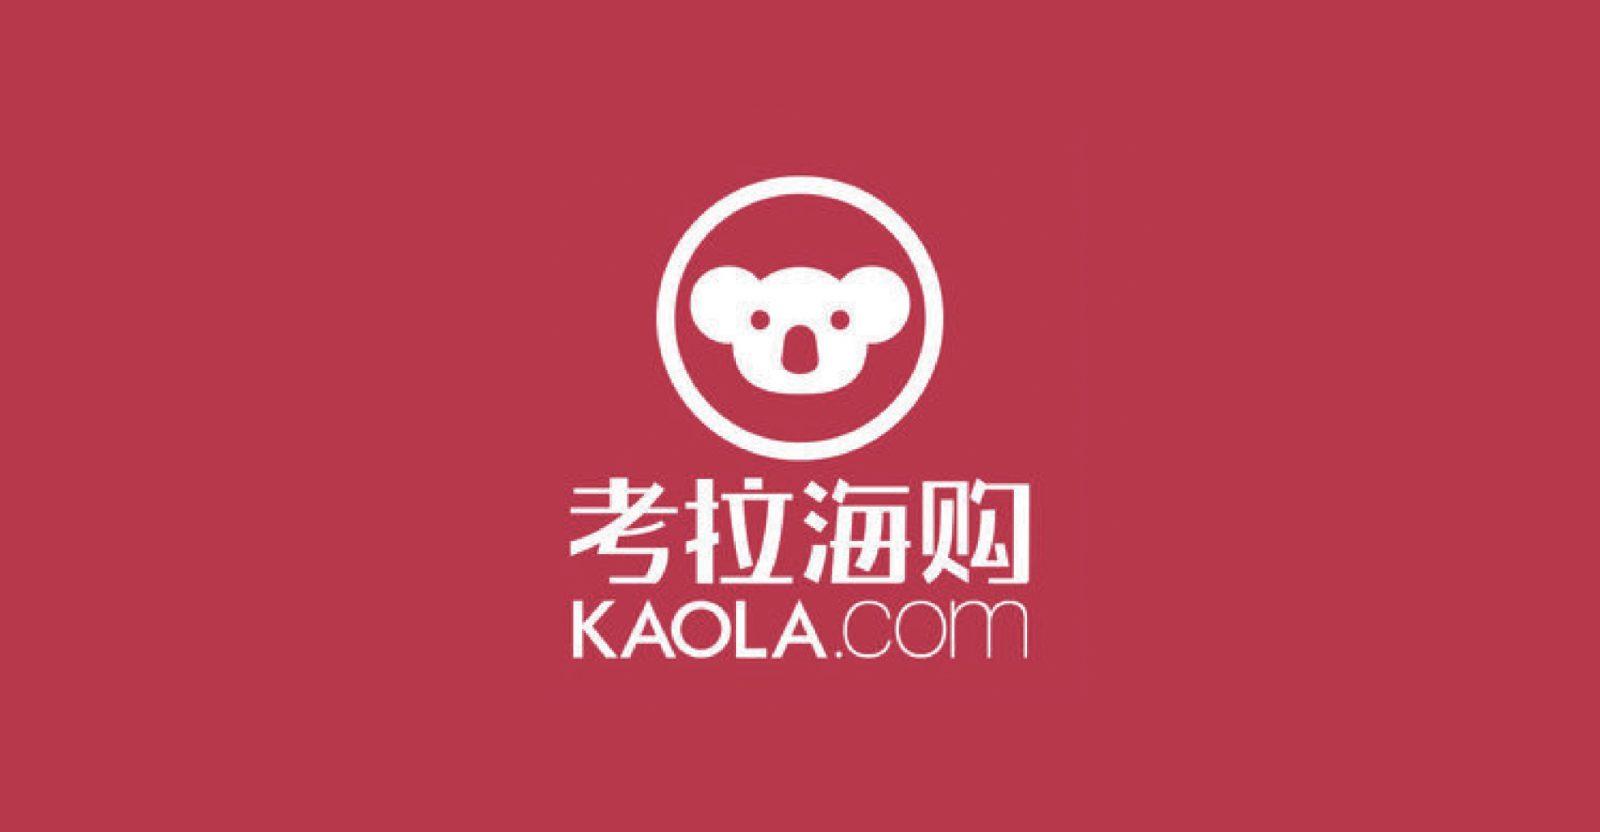 netease-kaola-1600x832